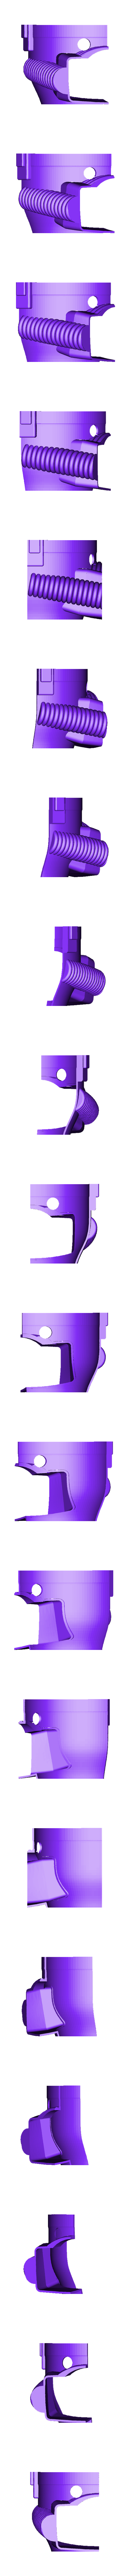 Breen_v3_part_3.stl Download free STL file Breen Helmet • 3D printer template, poblocki1982